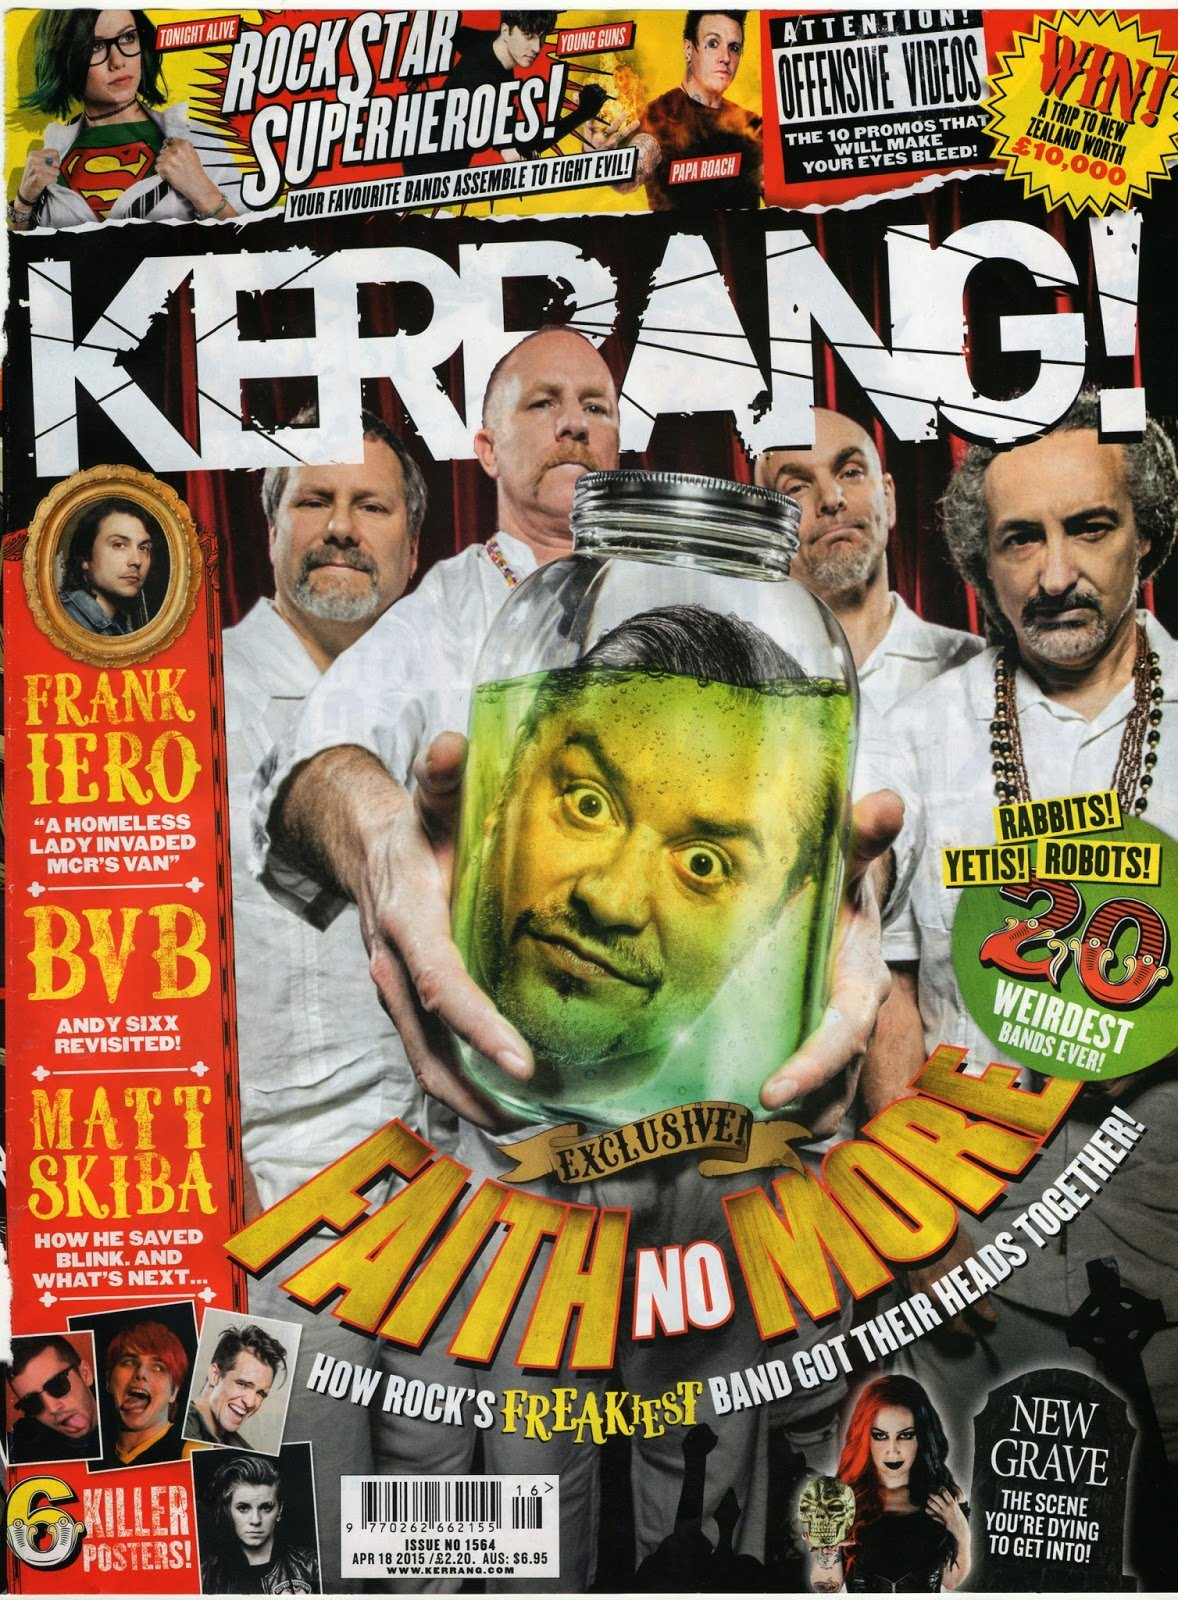 2015-KERRANG-FREAKS-COVER